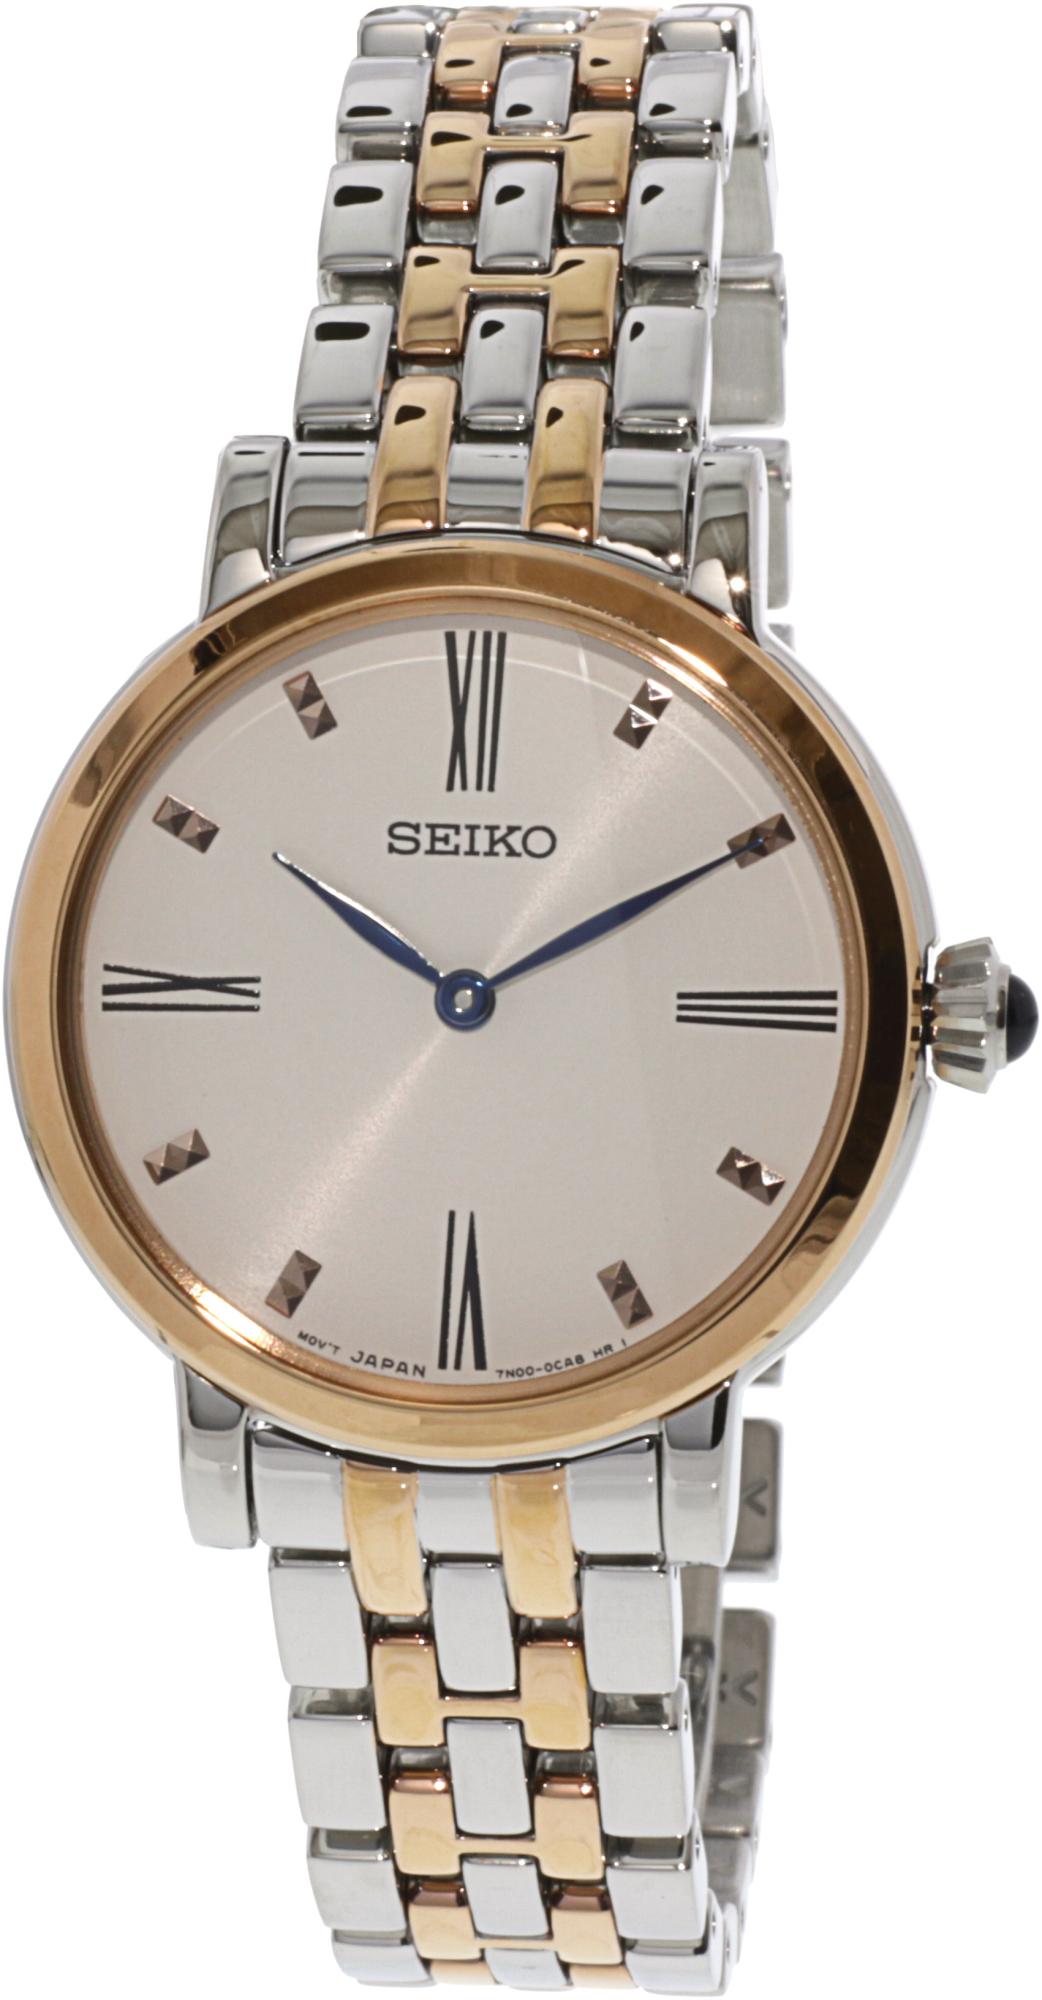 Seiko_Women's_SFQ816_Silver_Stainless-Steel_Japanese_Quartz_Dress_Watch